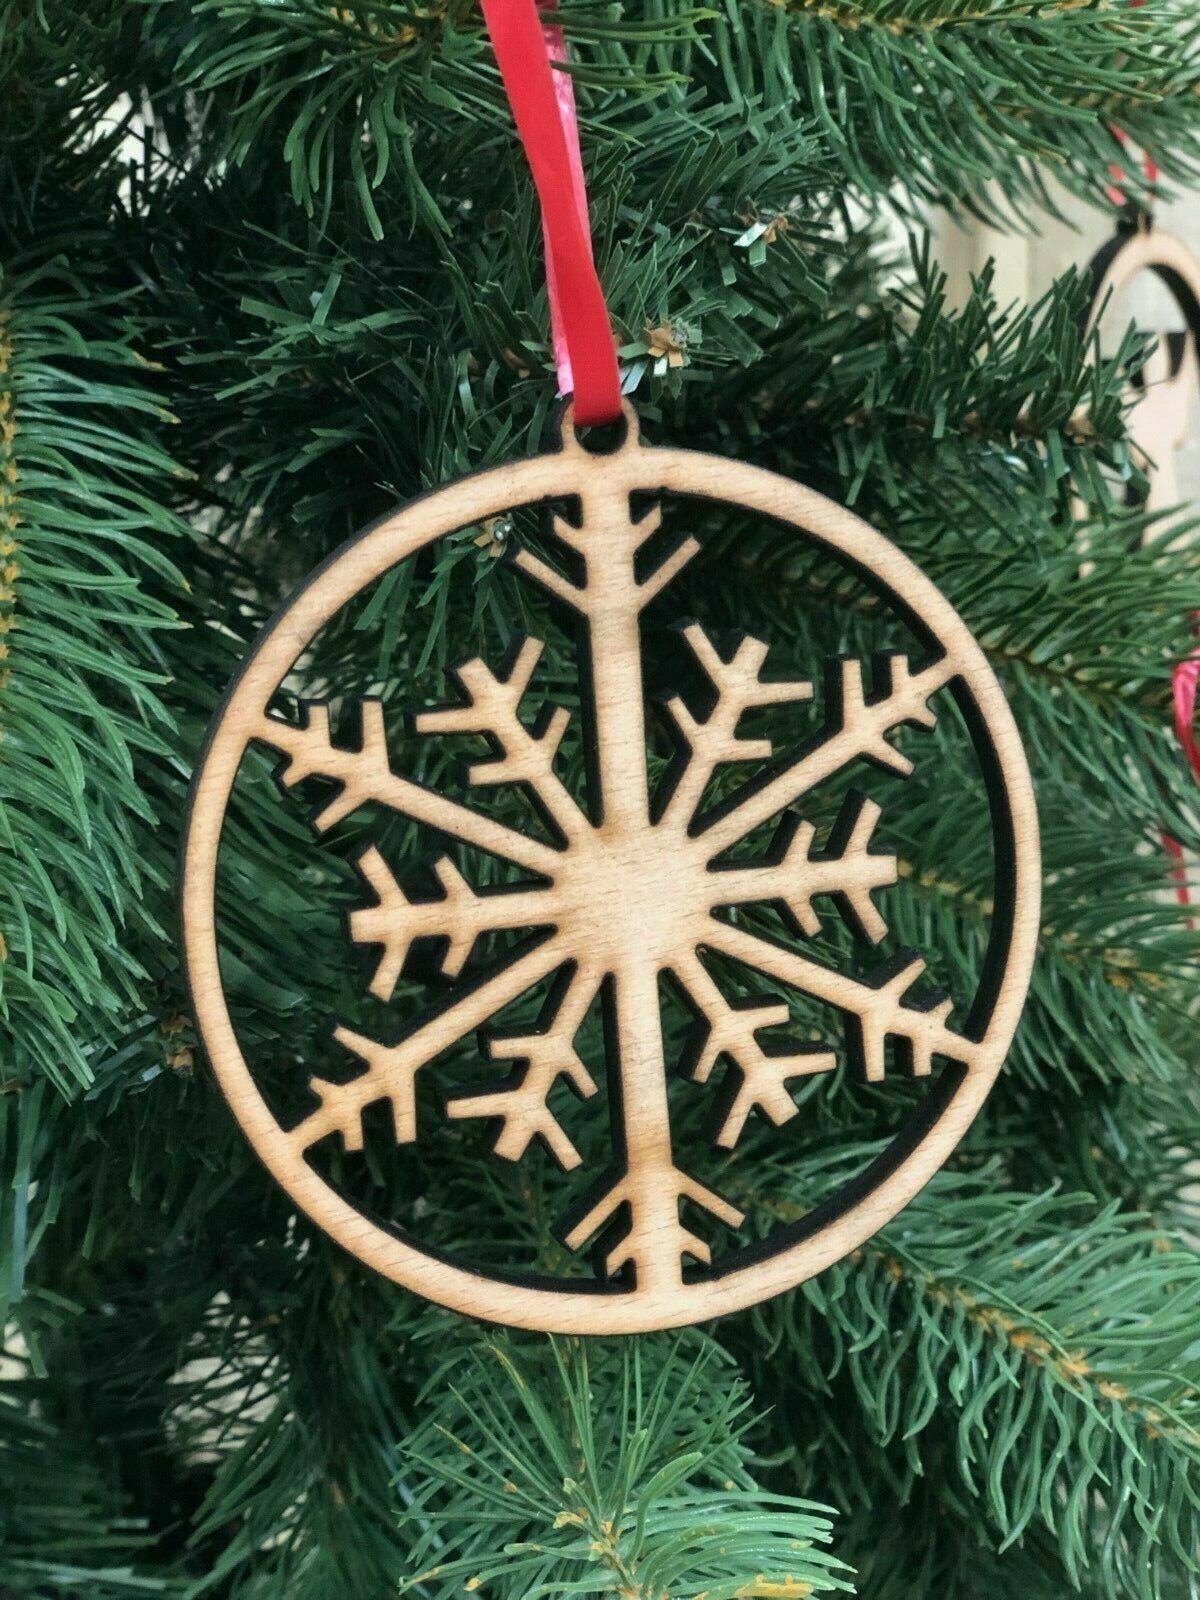 Wooden Christmas Tree Ornament Decoration Xmas Snowflake Bauble Ply Wood Gift Uk Ebay